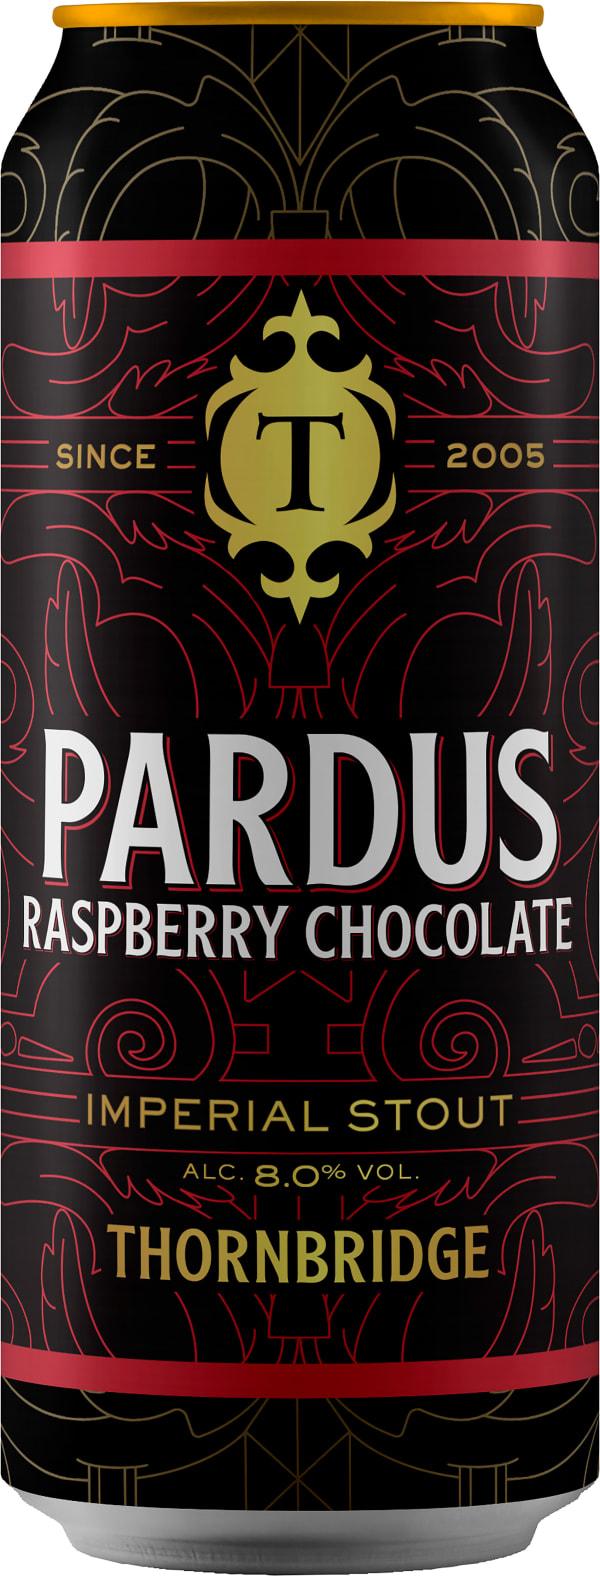 Thornbridge Pardus Raspberry Chocolate Imperial Stout can